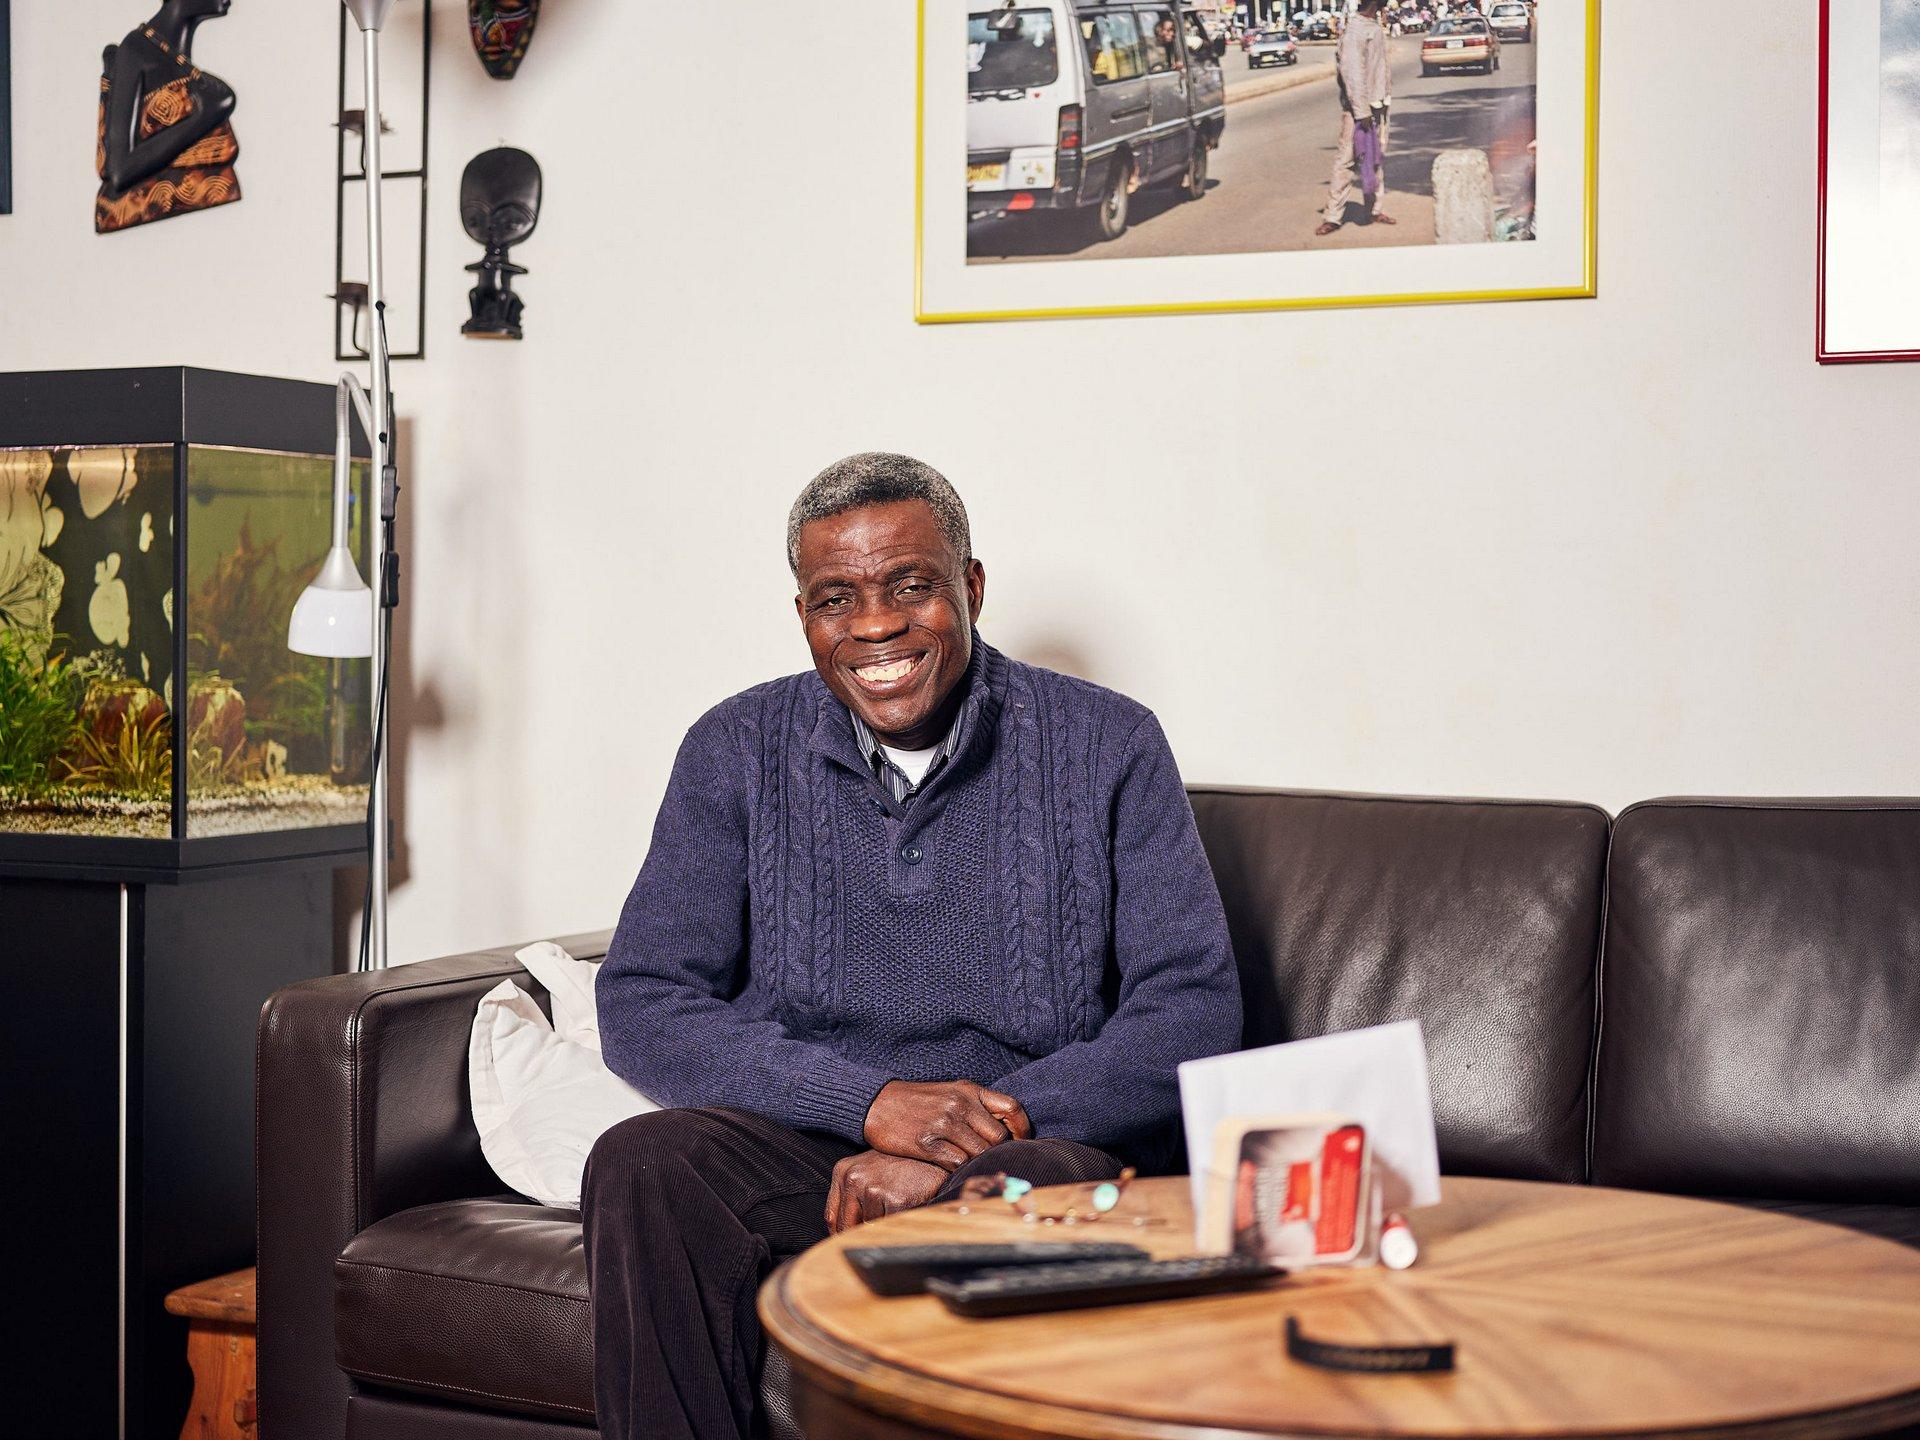 William Nketia kölnbeste koelnbeste köln beste GAG